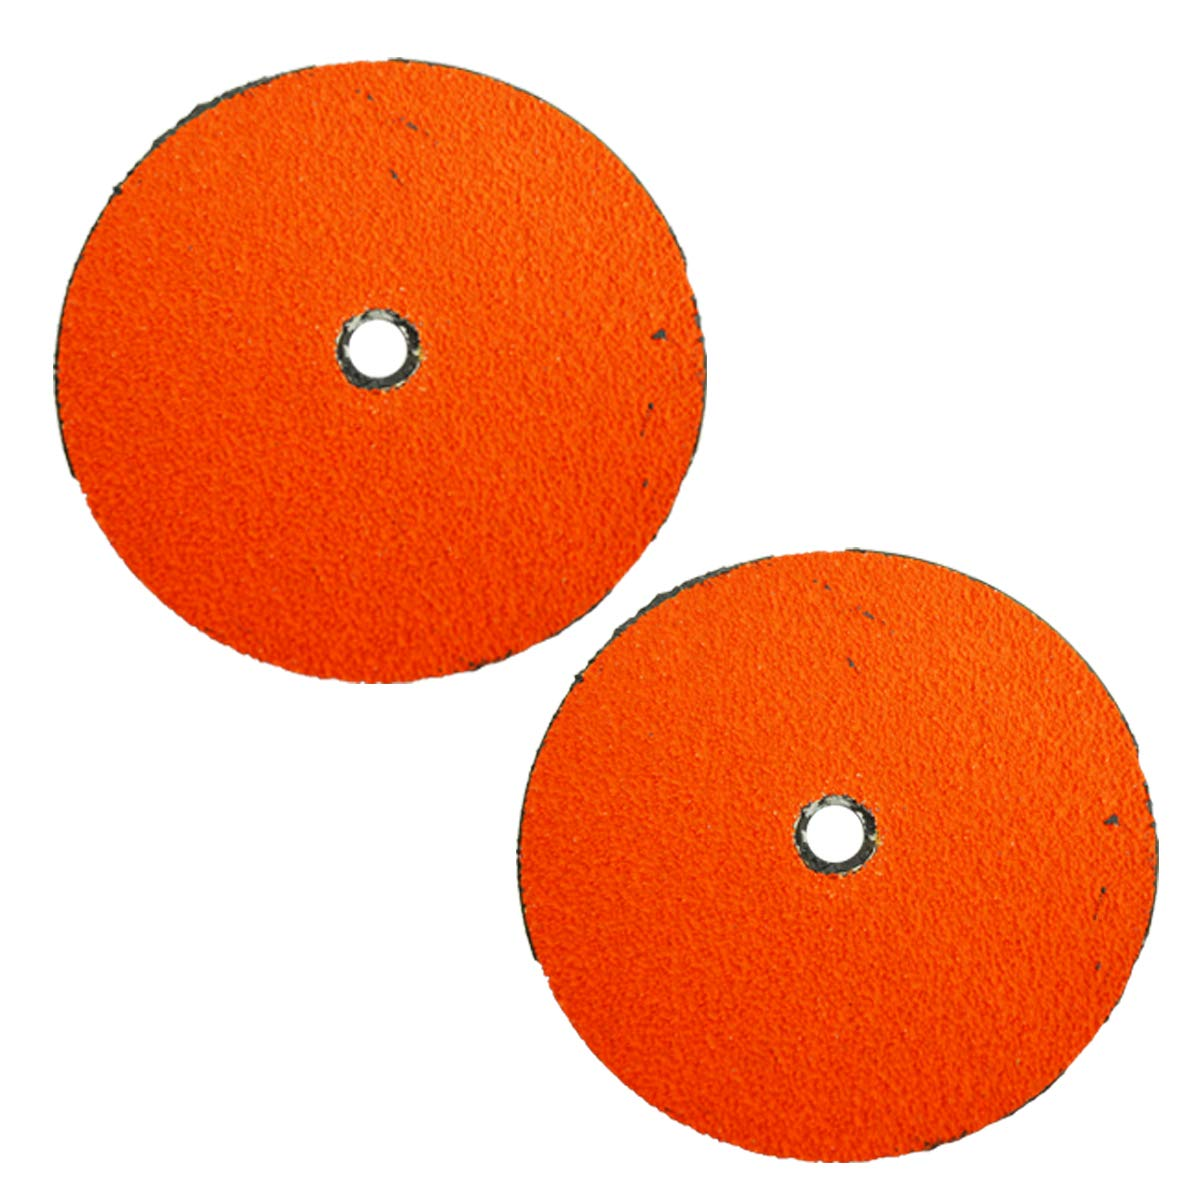 2 11710 Orange Disc 7 RBG712 Abrasive Grinding Wheel RBG Grinder 712 RBG780 780